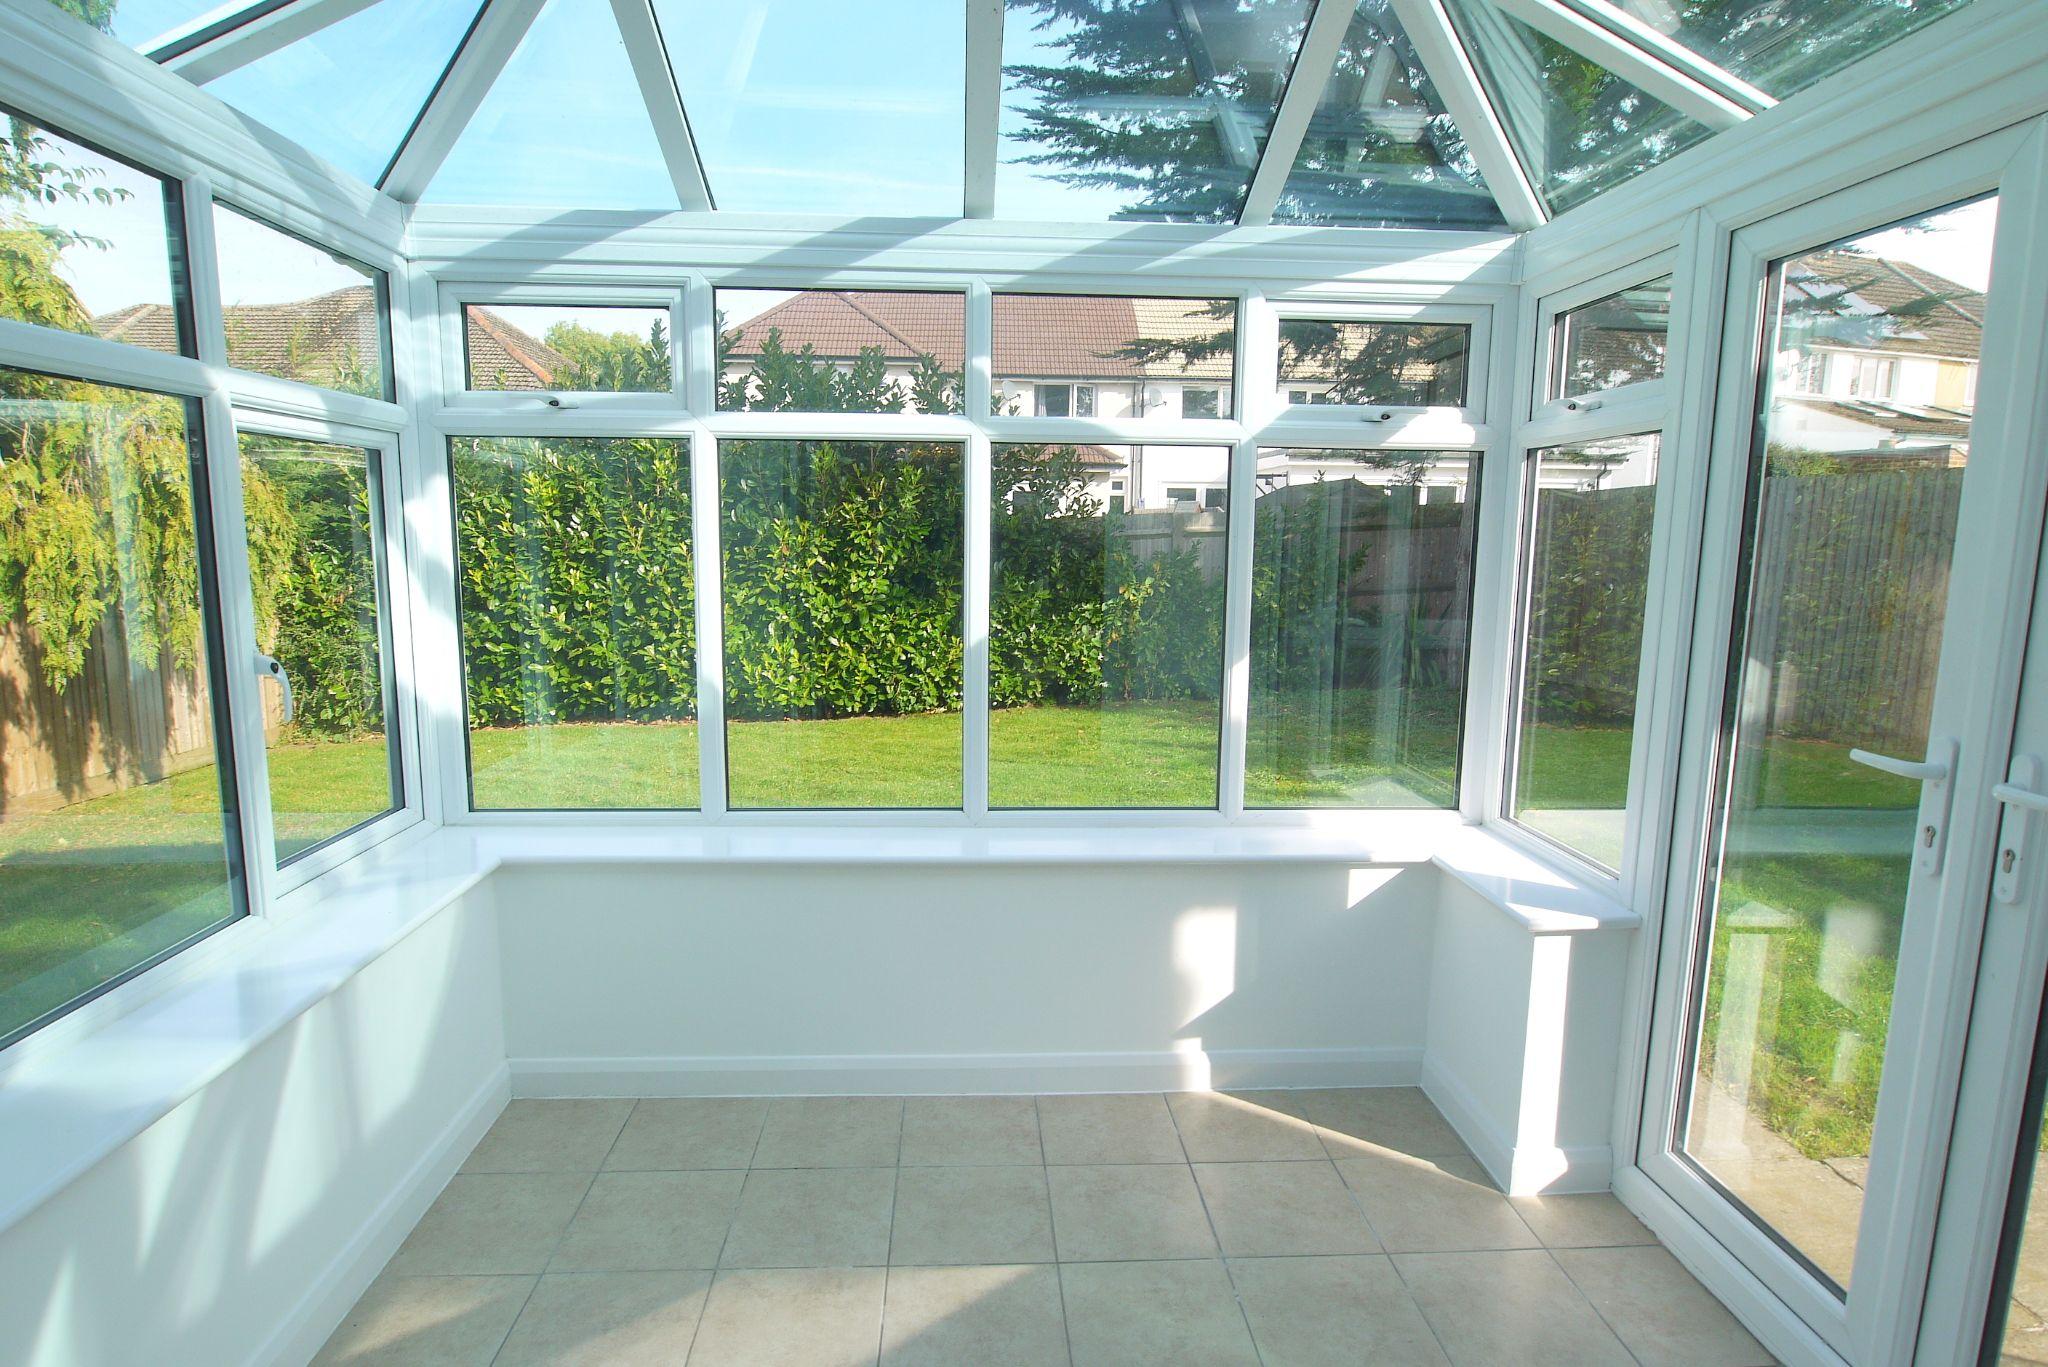 3 bedroom detached house Sold in Sevenoaks - Photograph 7